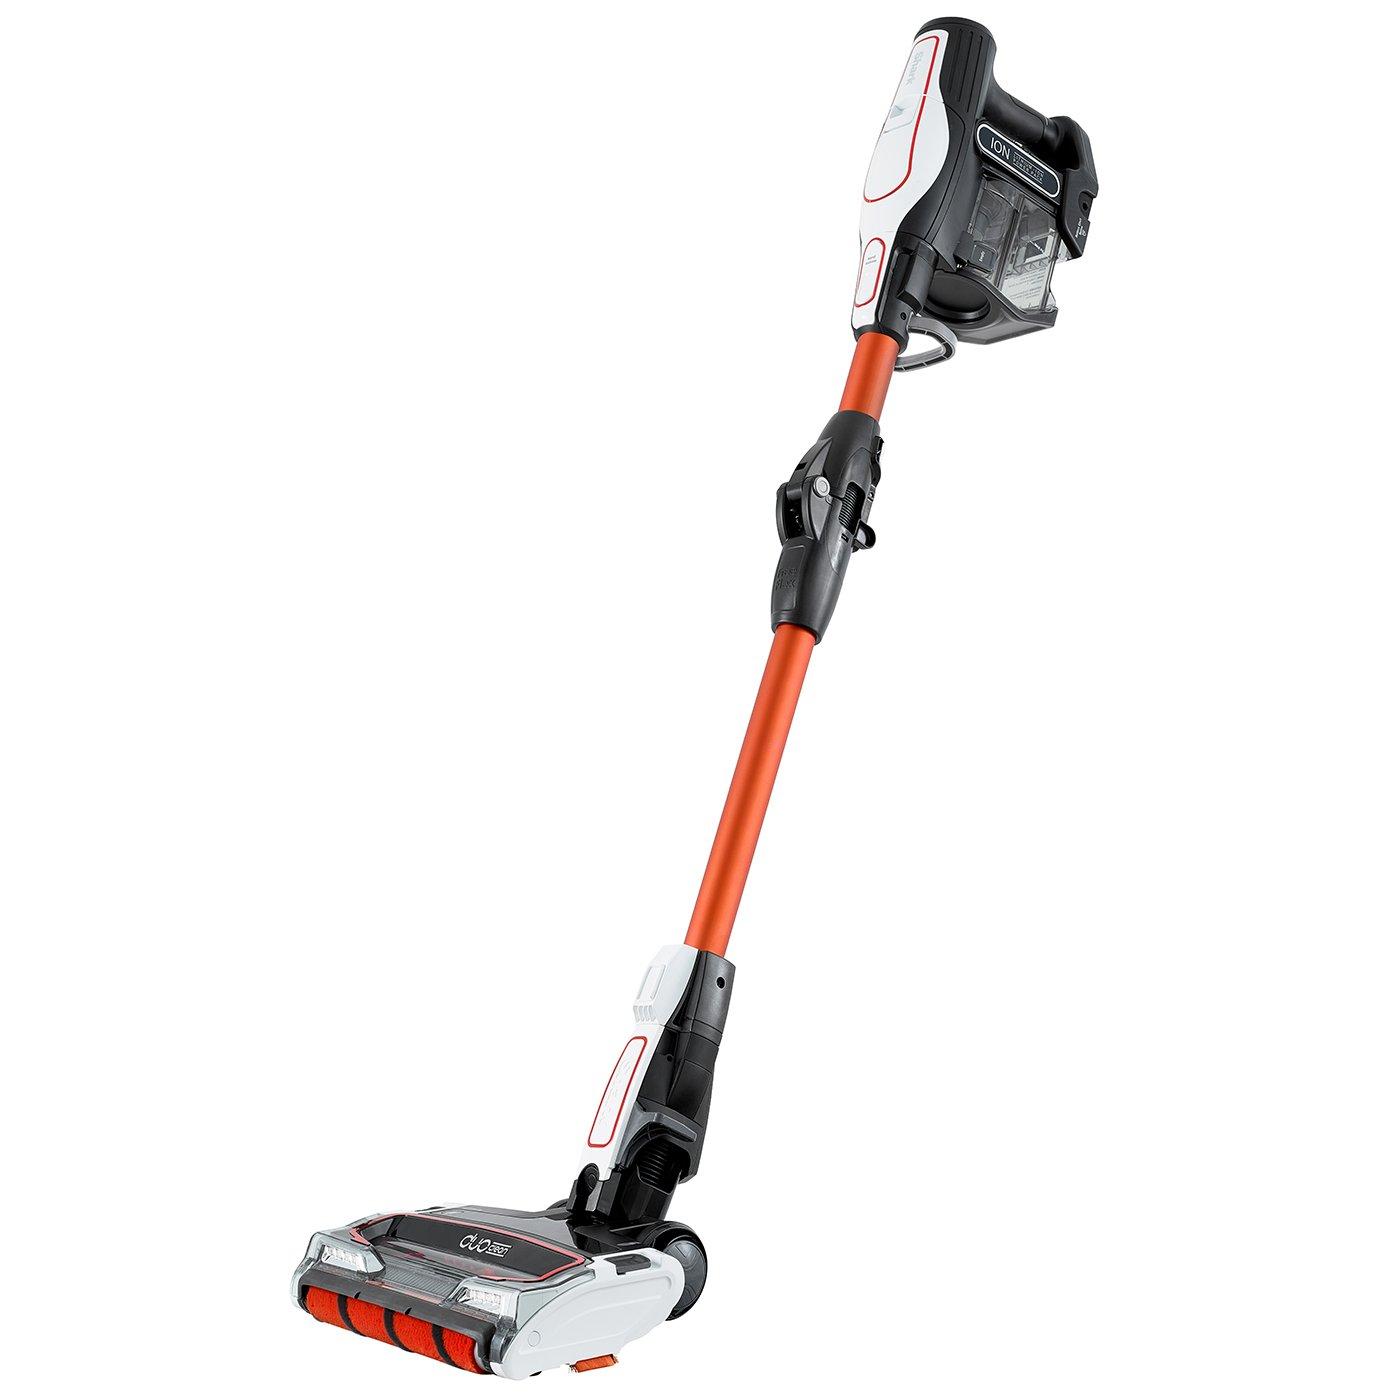 Shark Cordless Stick Vacuum Cleaner [IF250UK] Twin Battery, White and Orange